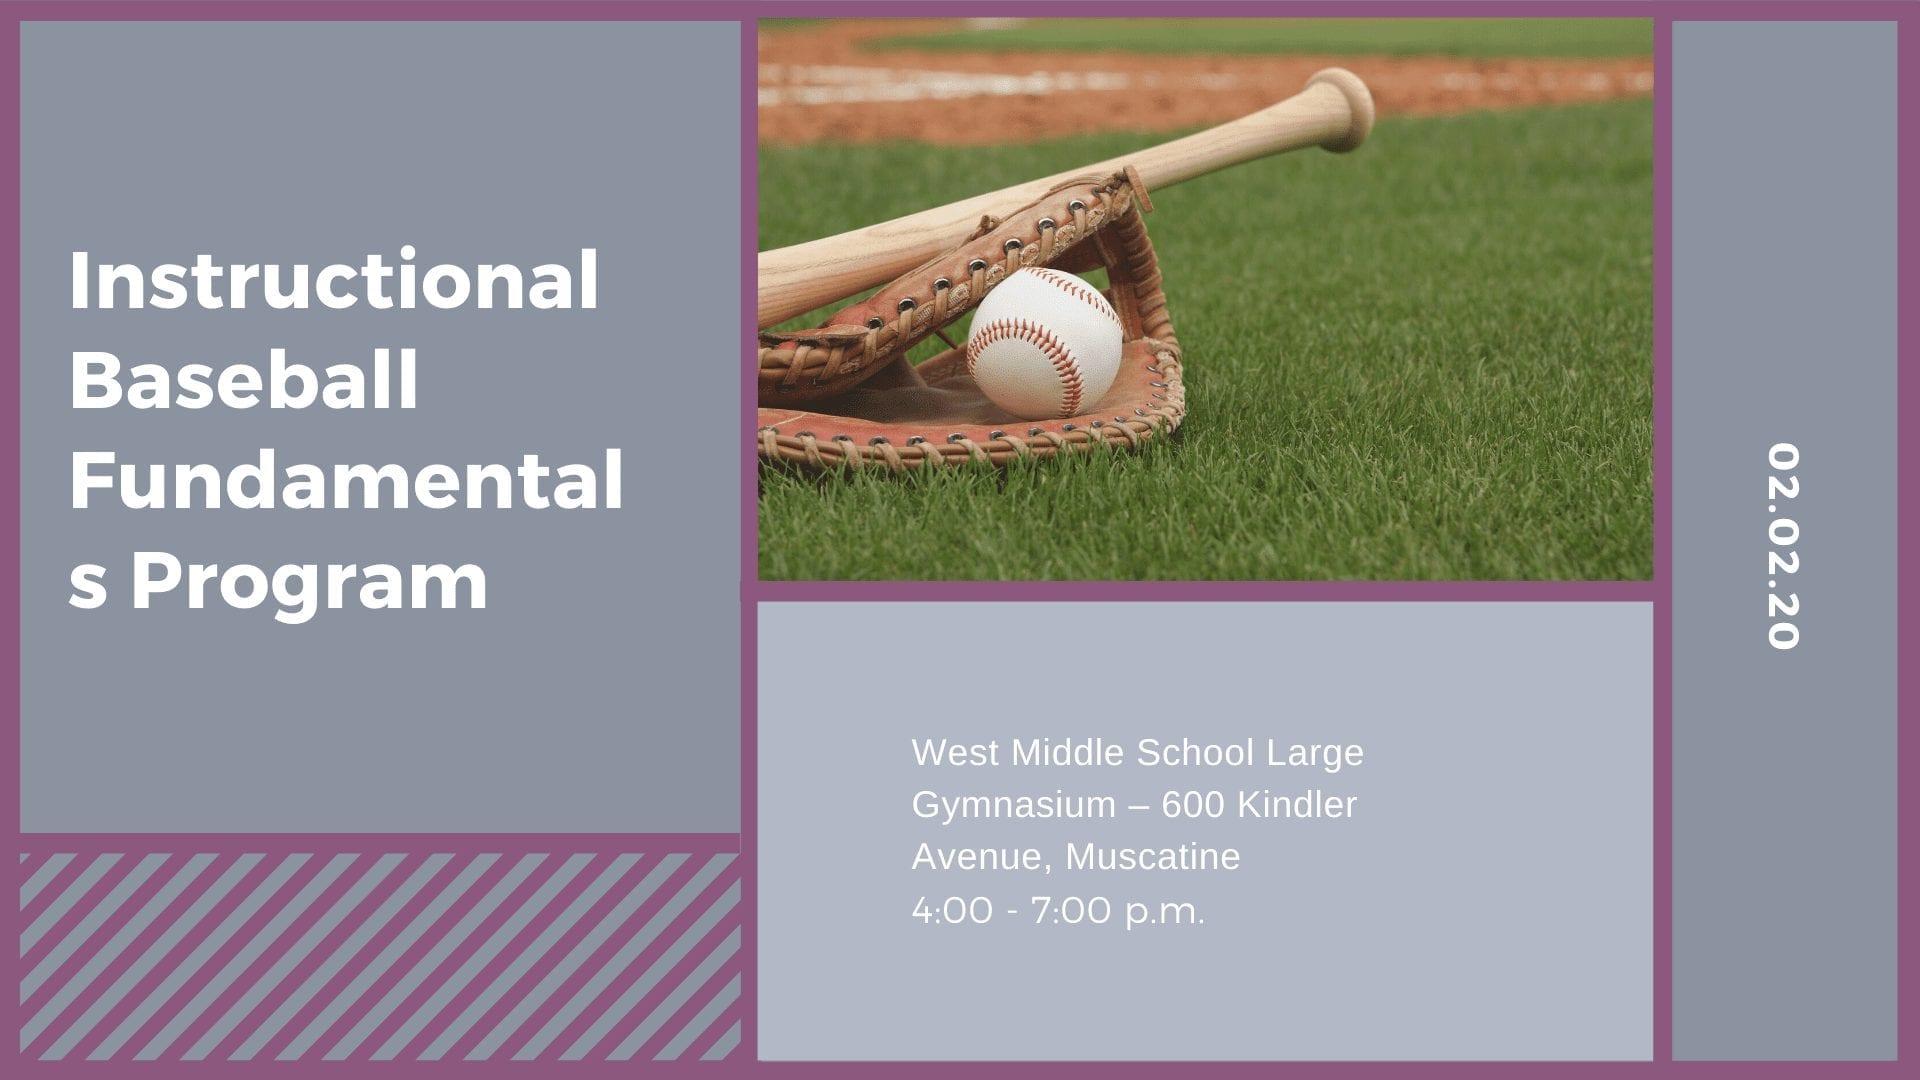 Instructional Baseball Fundamentals Program